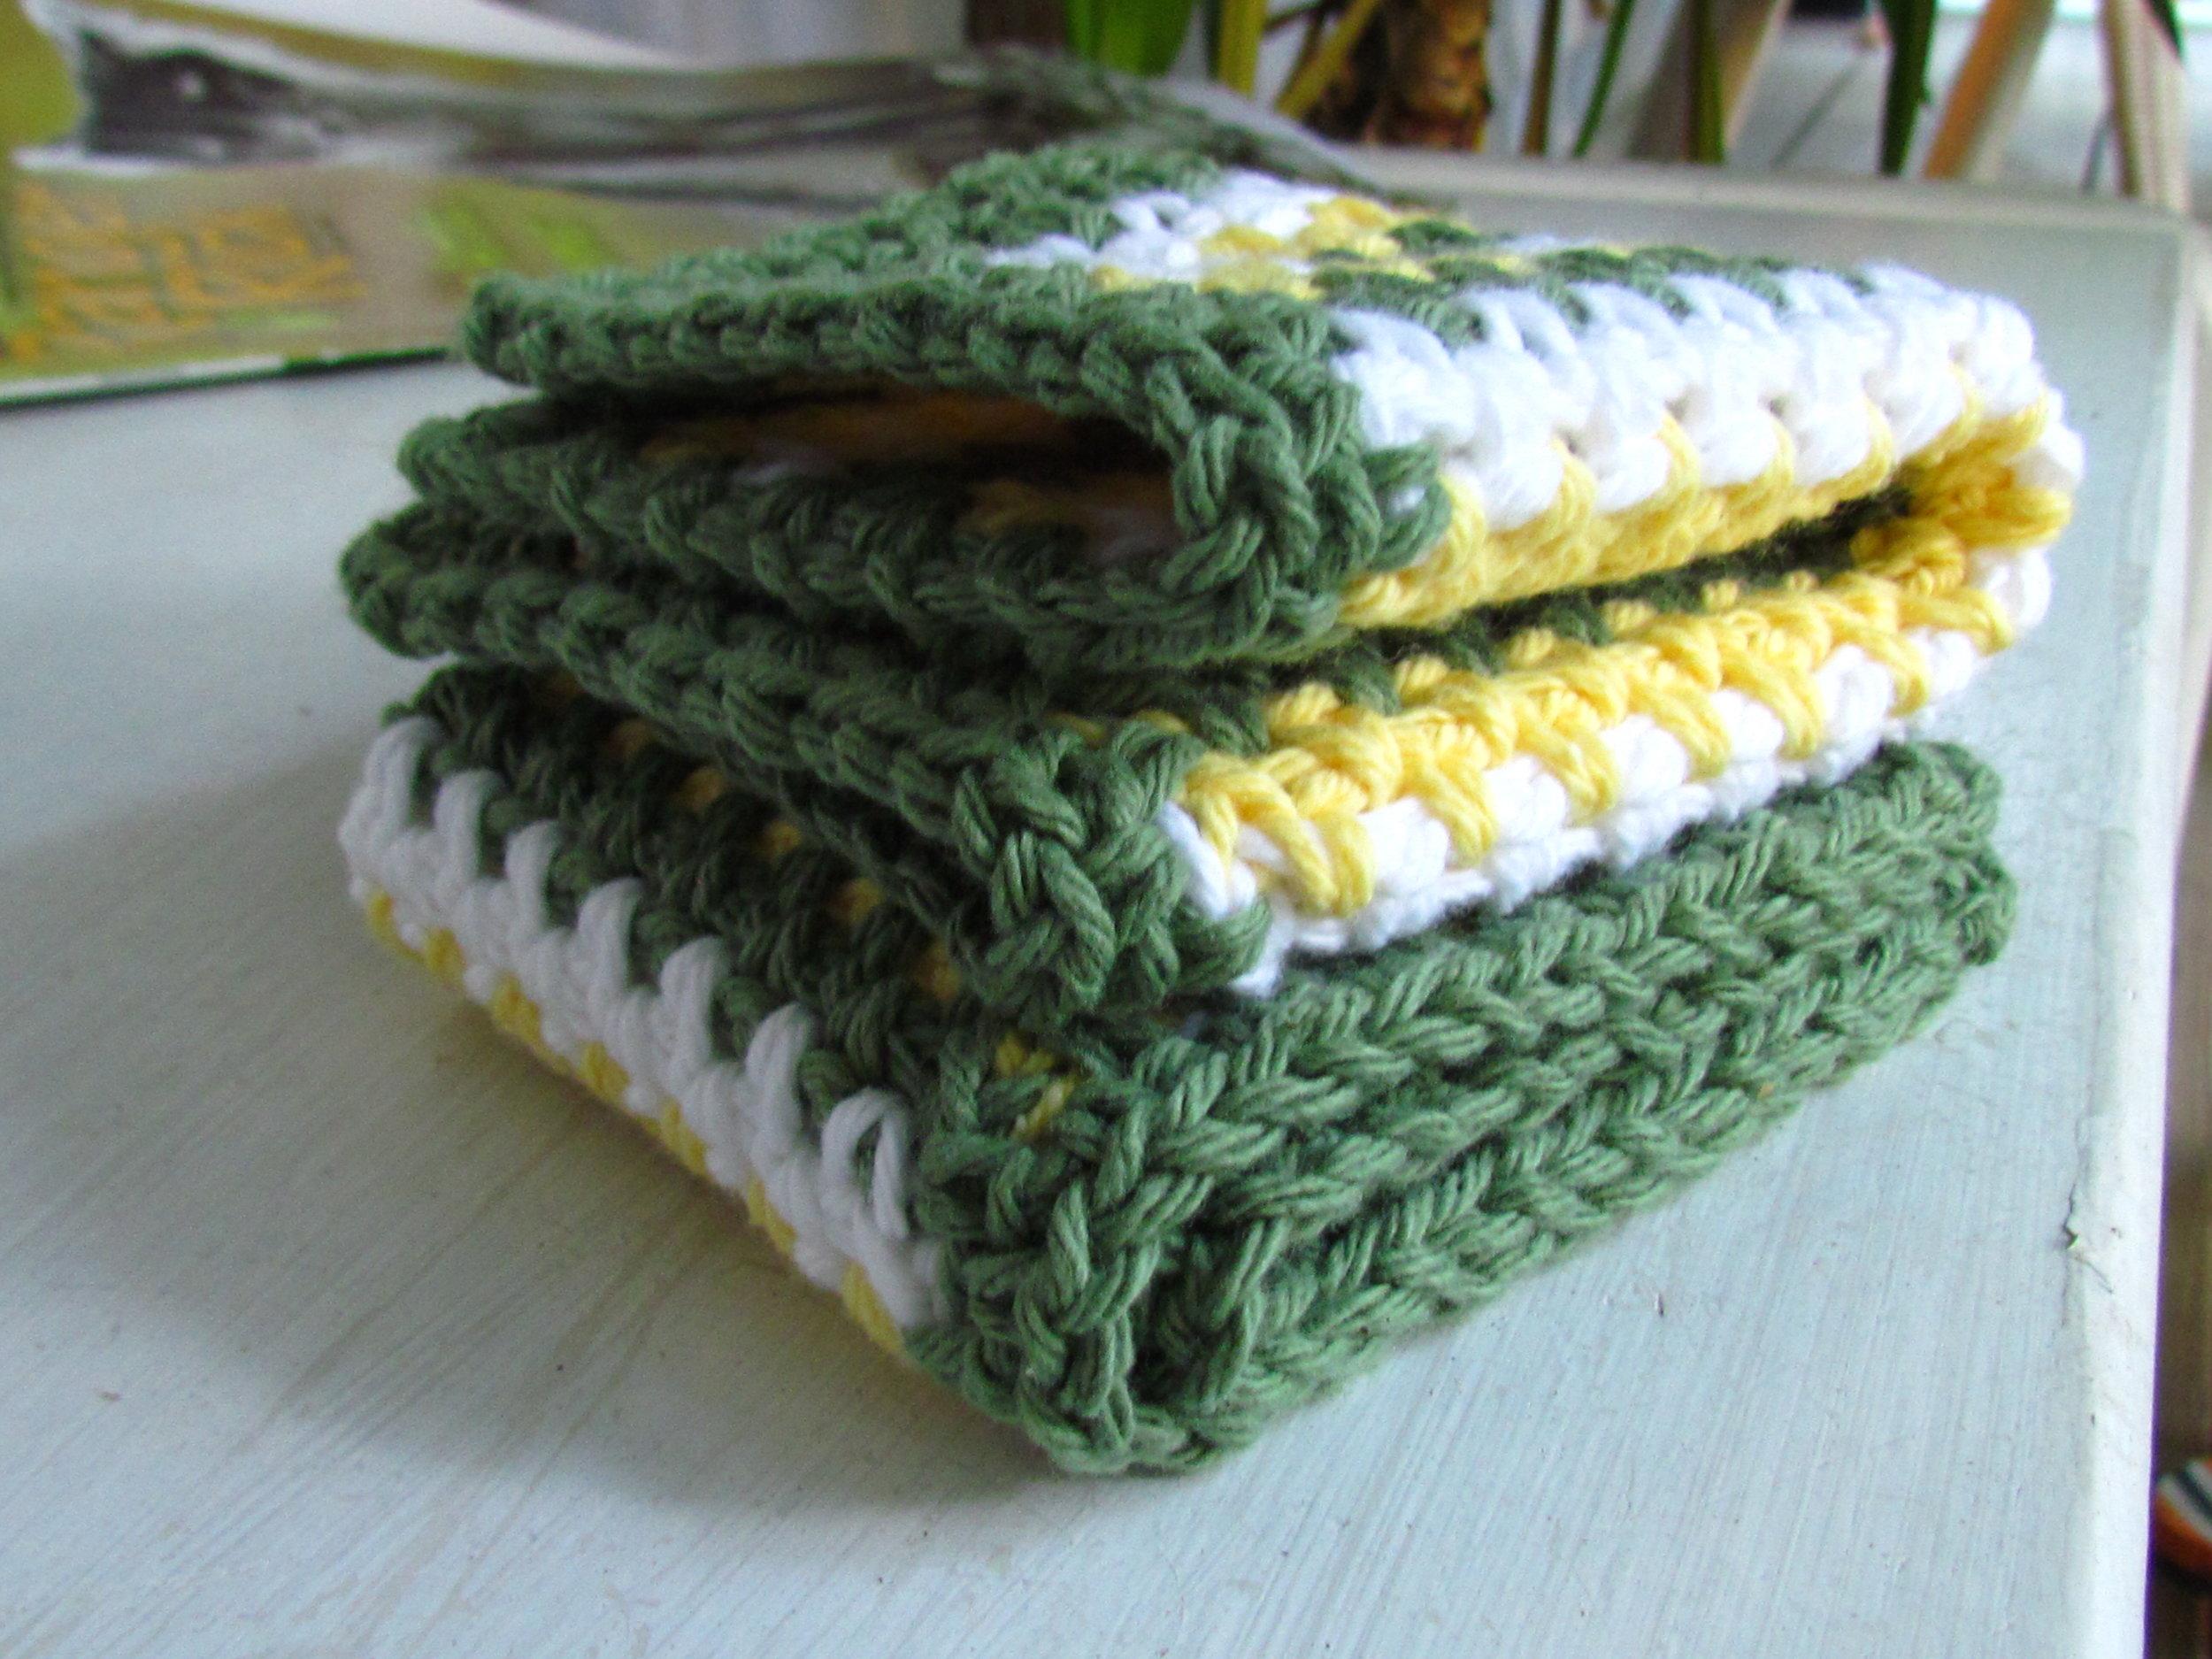 Crochet Gift Guide: Shower Edition